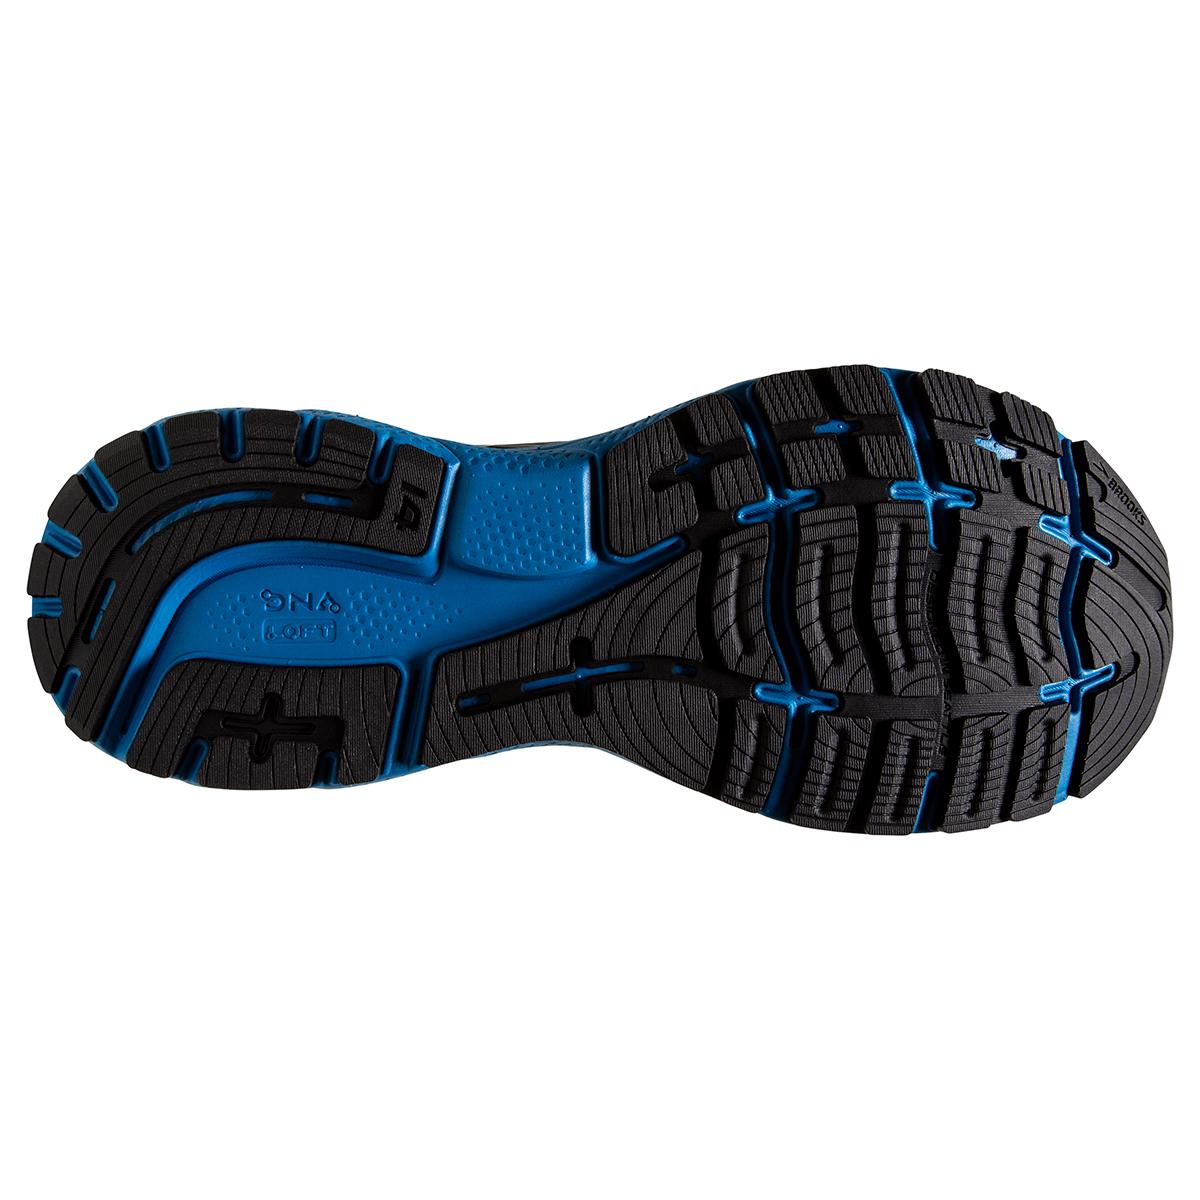 Men's Brooks Ghost 14 Running Shoe - Color: Black/Blackened - Size: 7 - Width: Regular, Black/Blackened, large, image 4